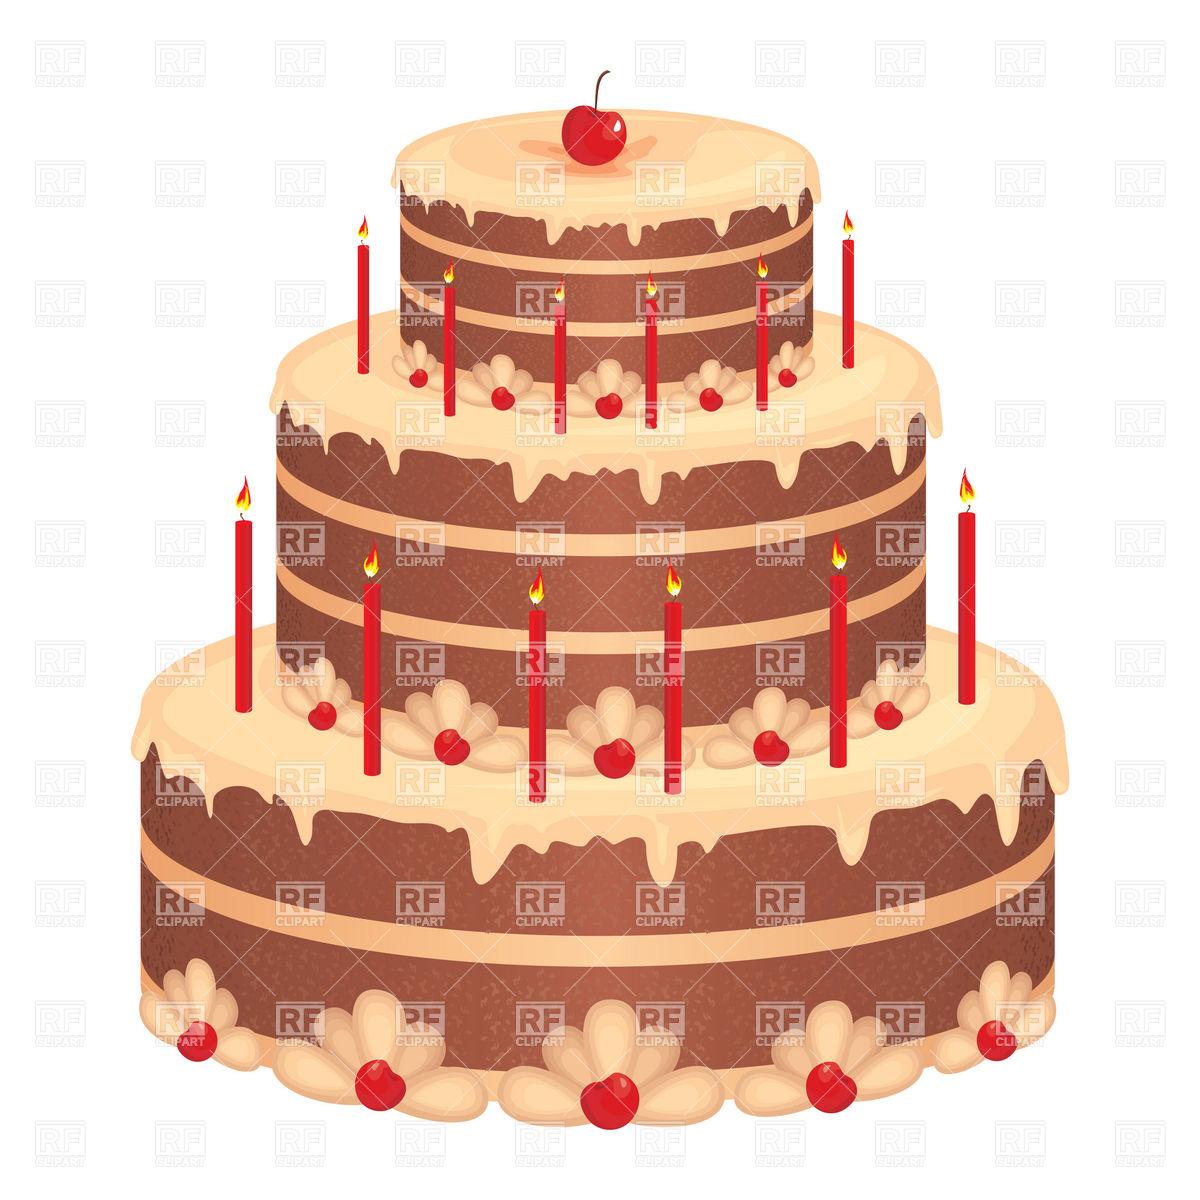 1200x1200 Big Birthday Cake Vector Image Vector Artwork Of Food And